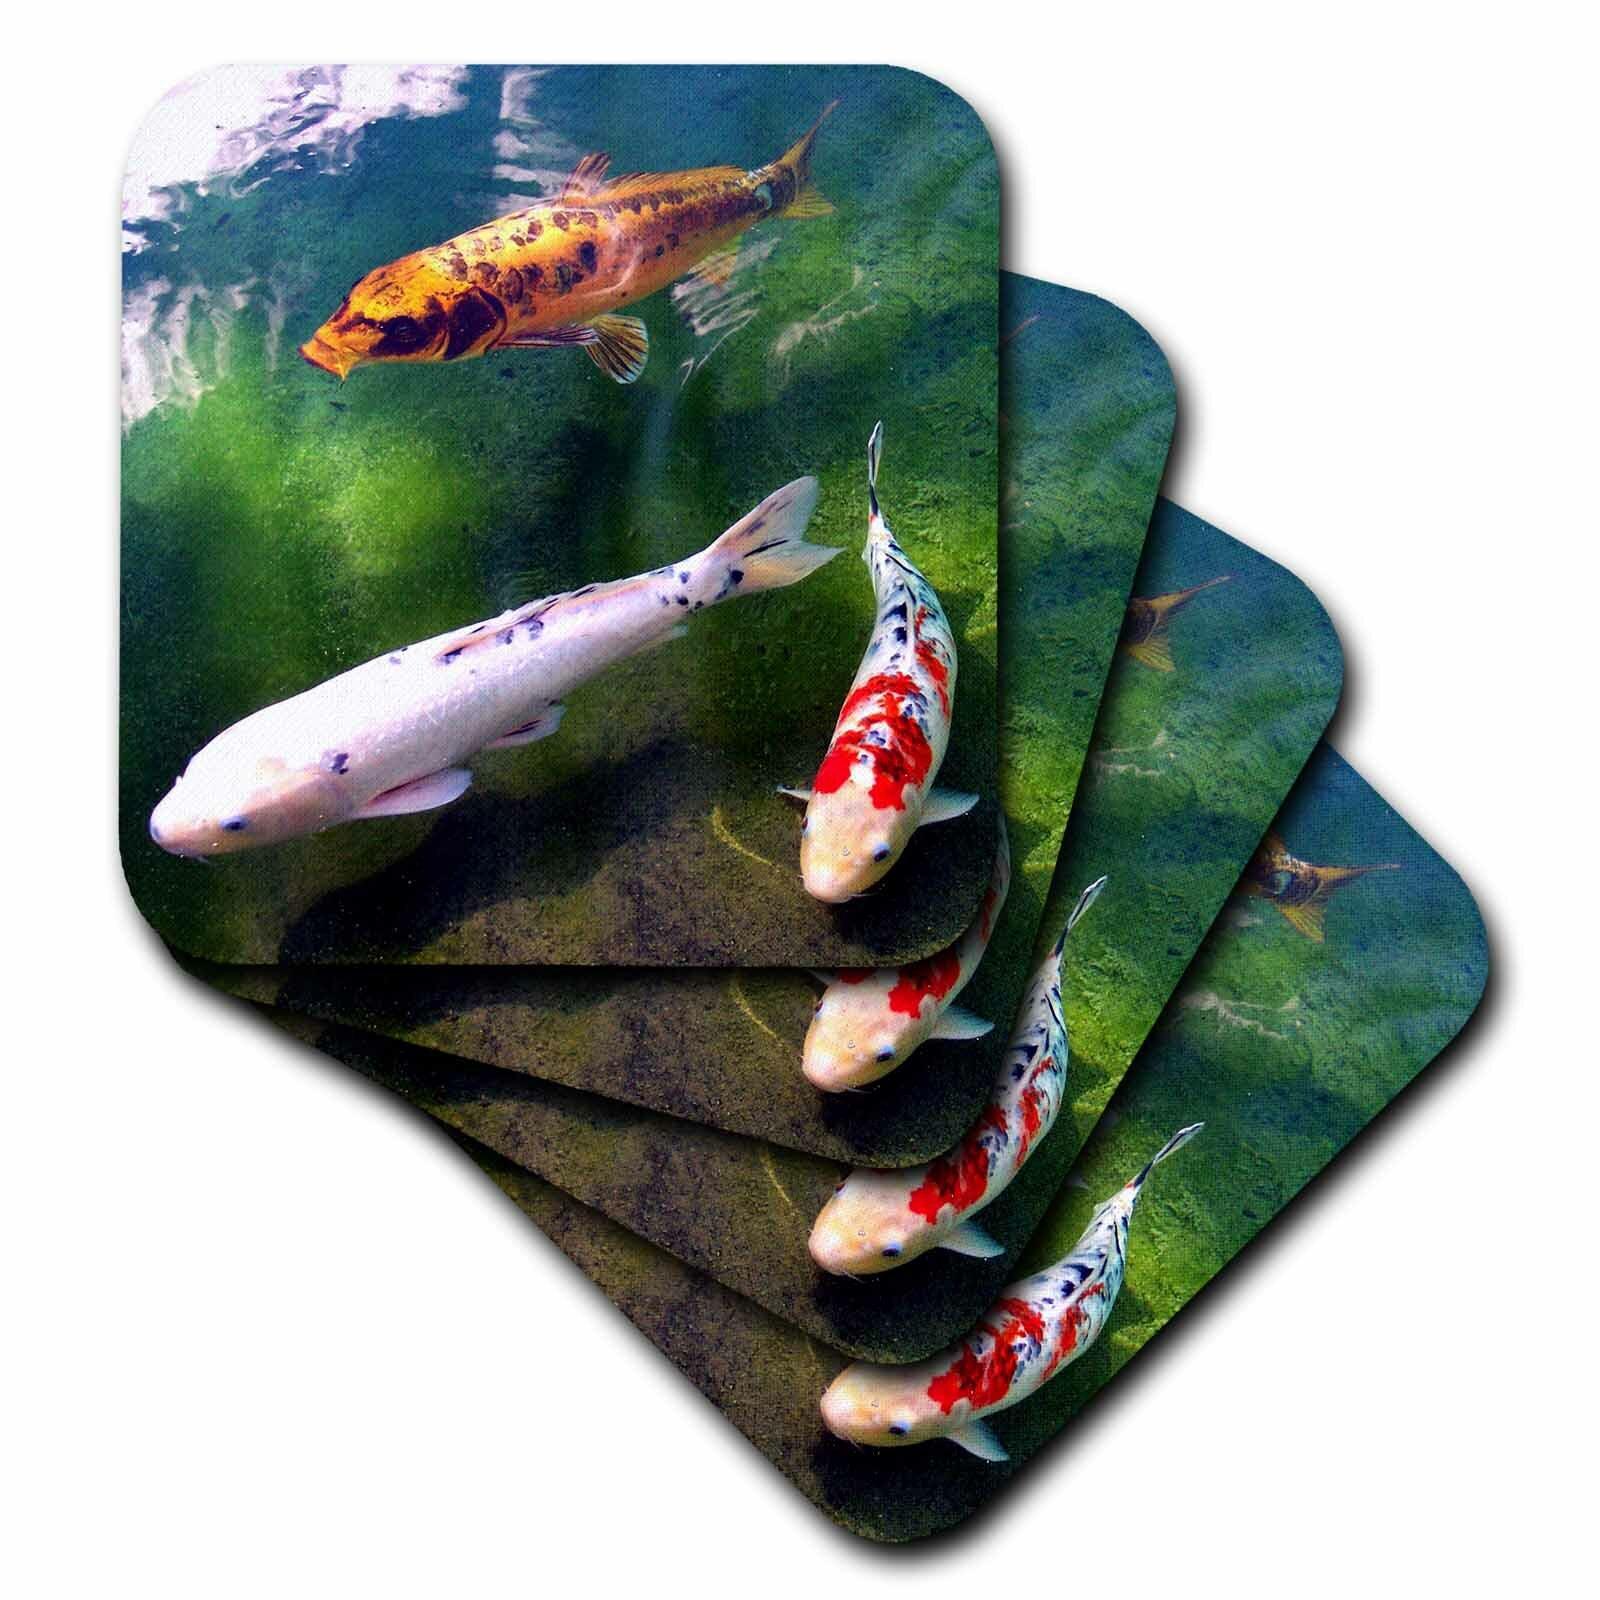 3drose Ceramic Tile Coasters Chinese Koi Carp Fish Set Of 4 Cst 2879 3 Wayfair